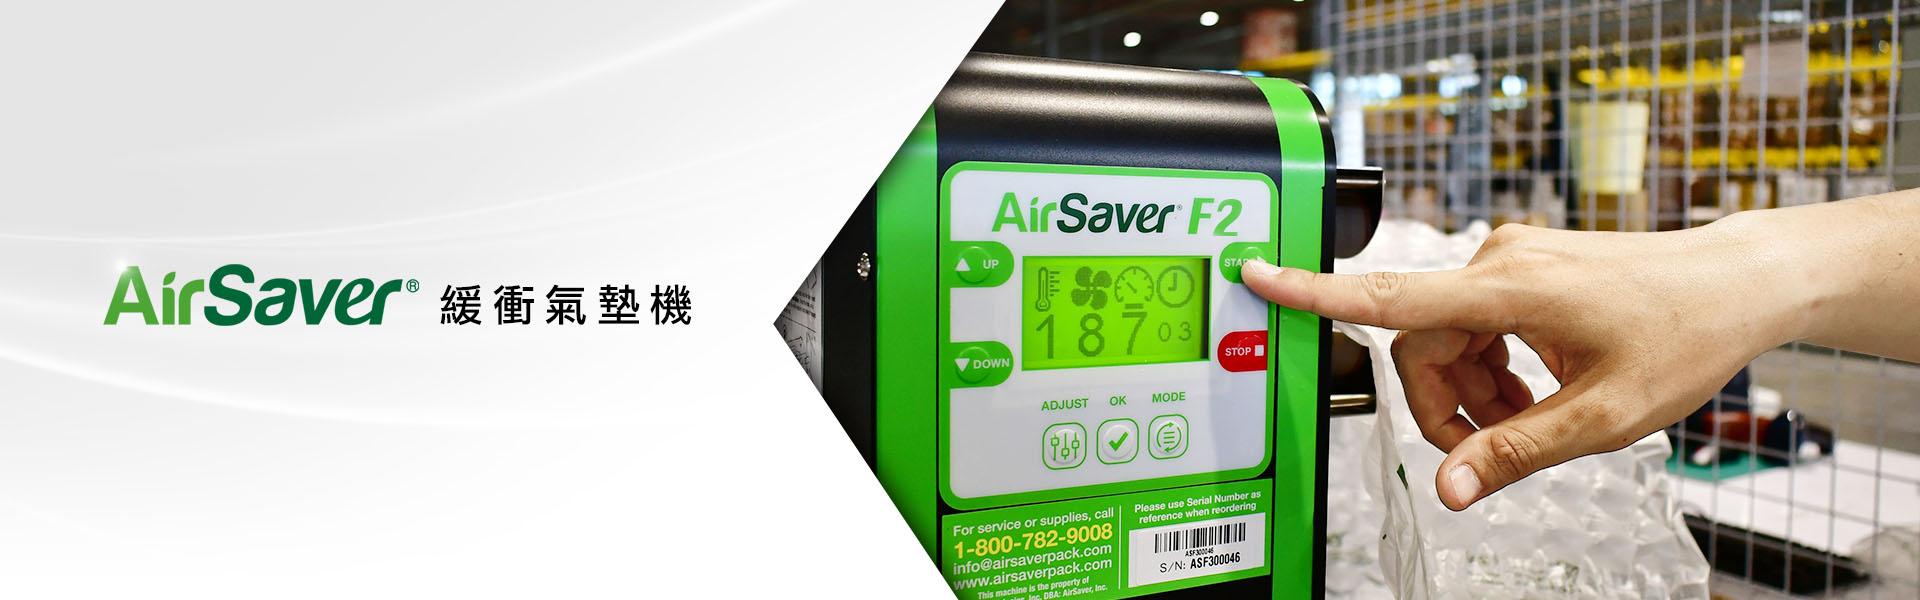 AirSaver緩衝氣墊機